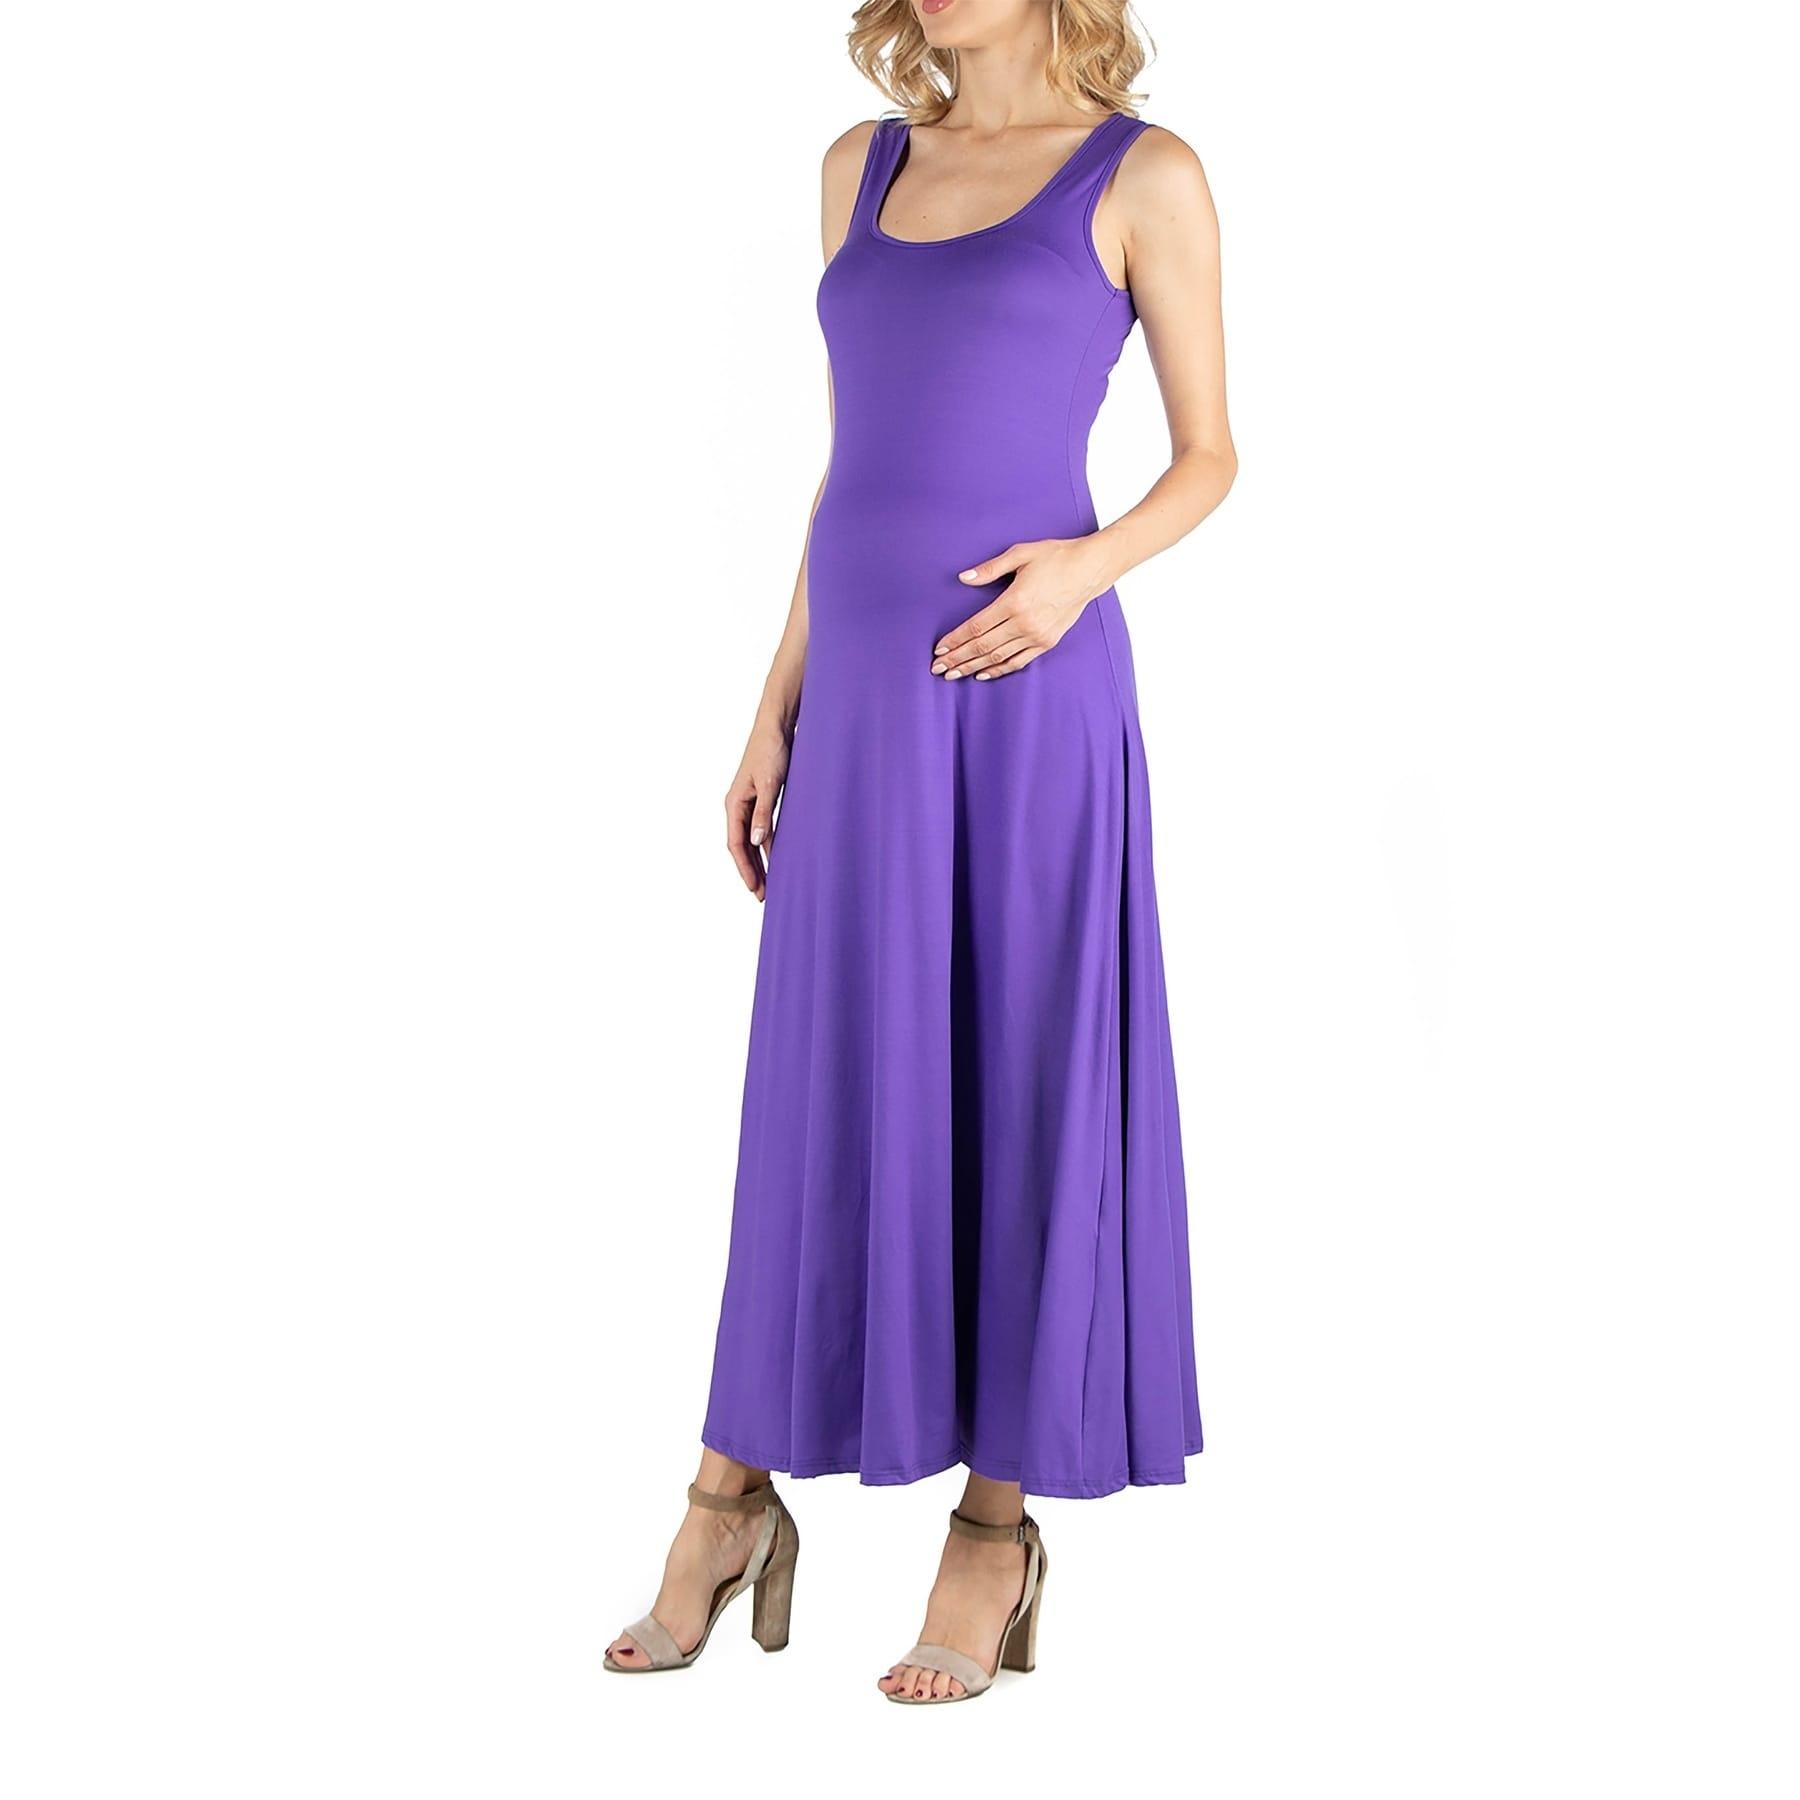 Slim Fit A Line Sleeveless Maternity Maxi Dress Overstock 31149699